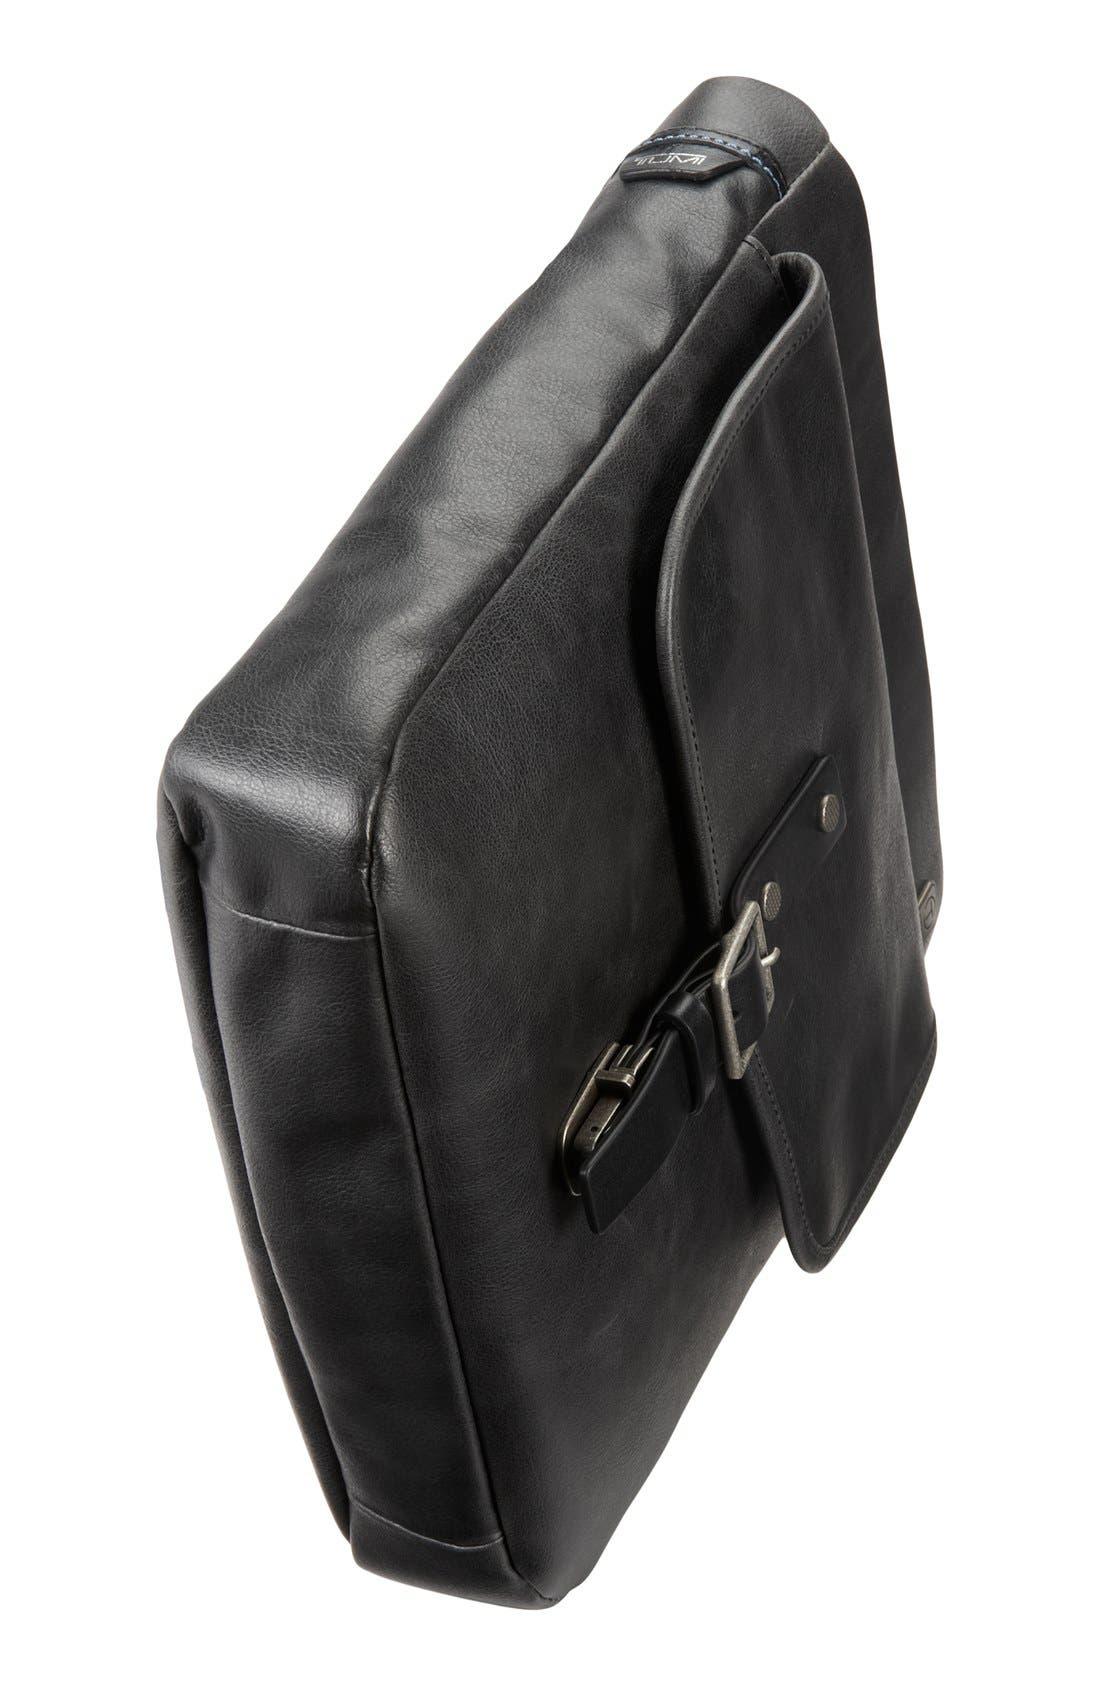 T-Tech by Tumi 'Forge - Pueblo' Top Zip Crossbody Bag,                             Alternate thumbnail 5, color,                             001